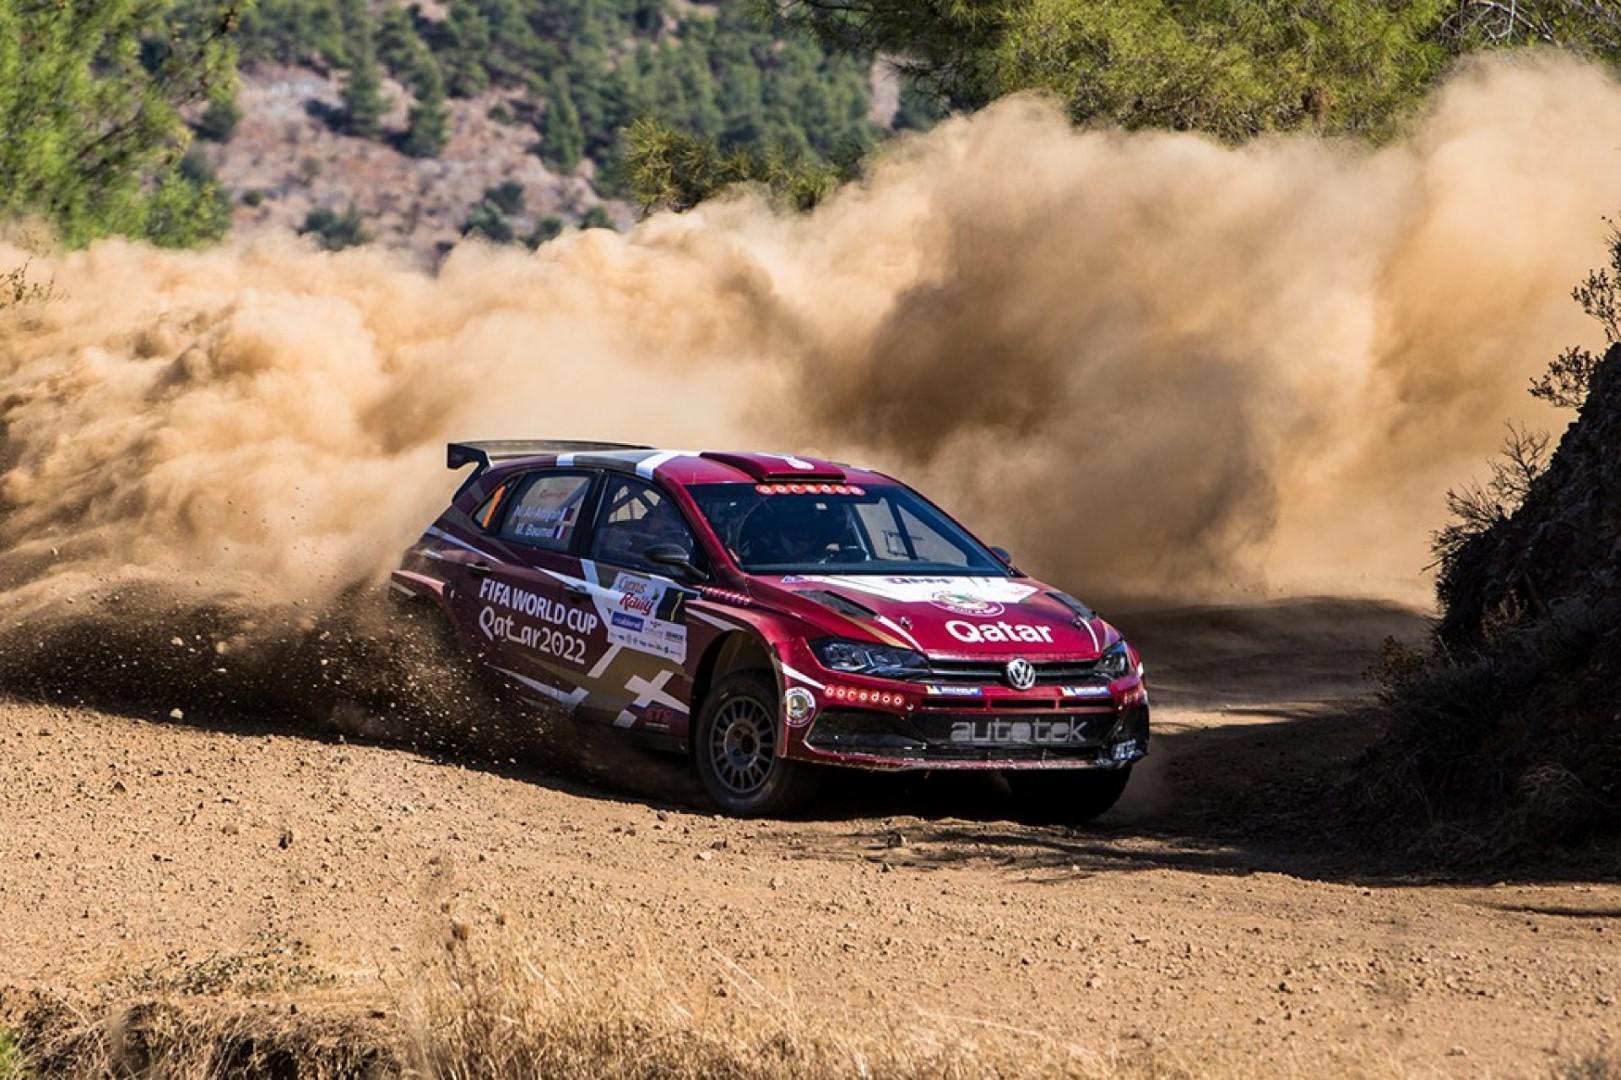 Al-Attiyah / Baumel remportent le 49ème Rallye de Chypre